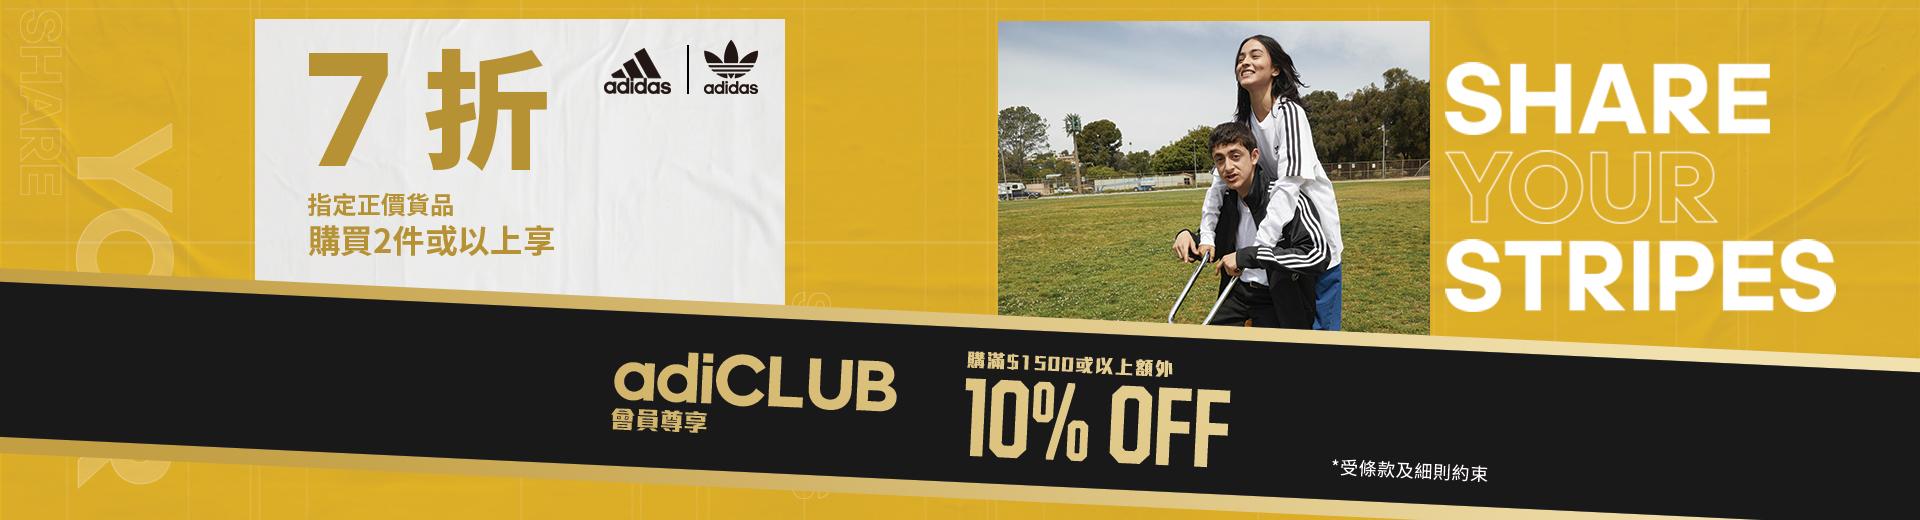 Adidas優惠代碼:網上限定優惠